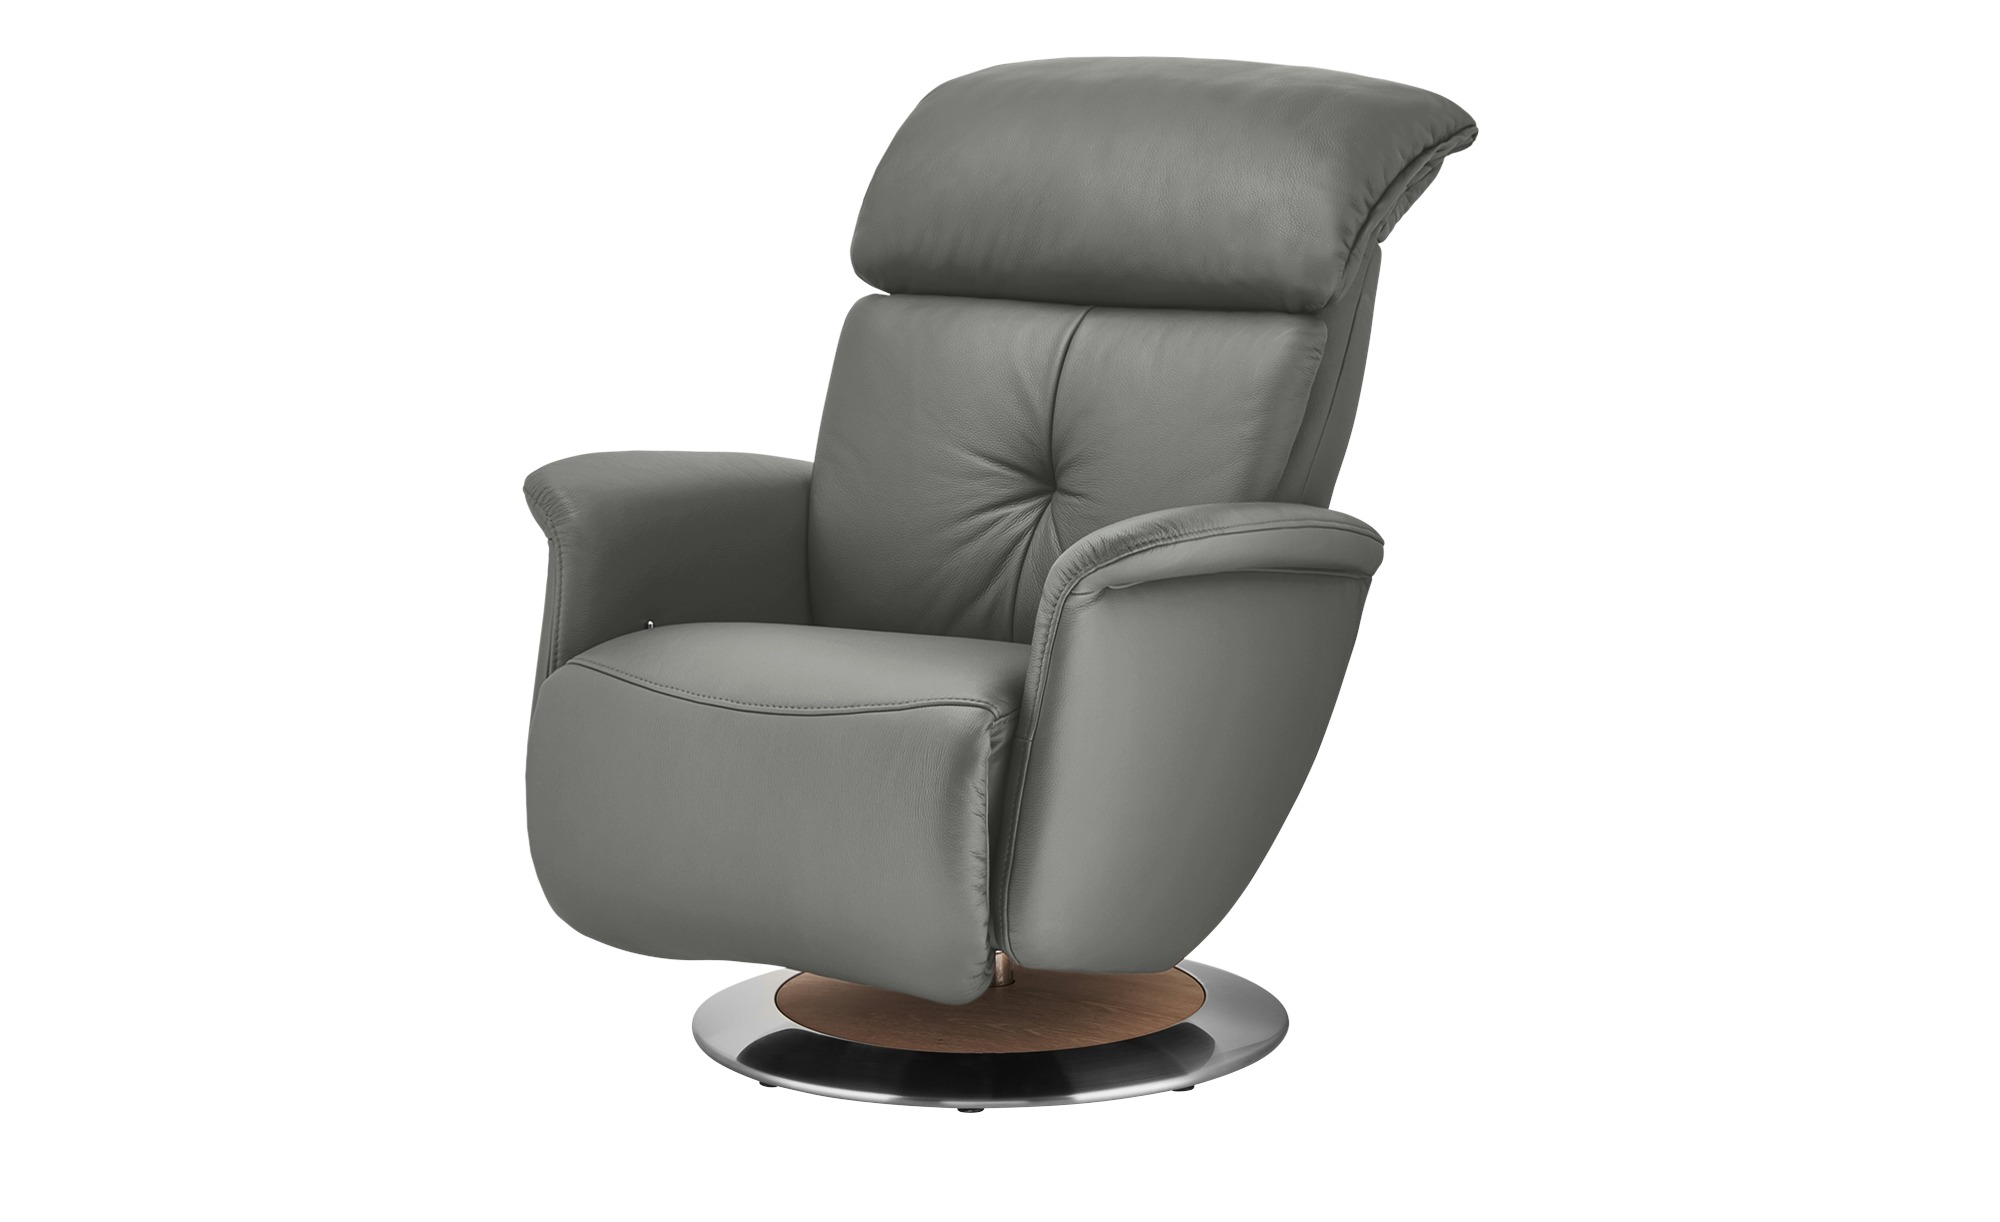 himolla Funktionssessel  7708 ¦ grau ¦ Maße (cm): B: 79 H: 99 T: 101 Polstermöbel > Sessel > Ledersessel - Höffner